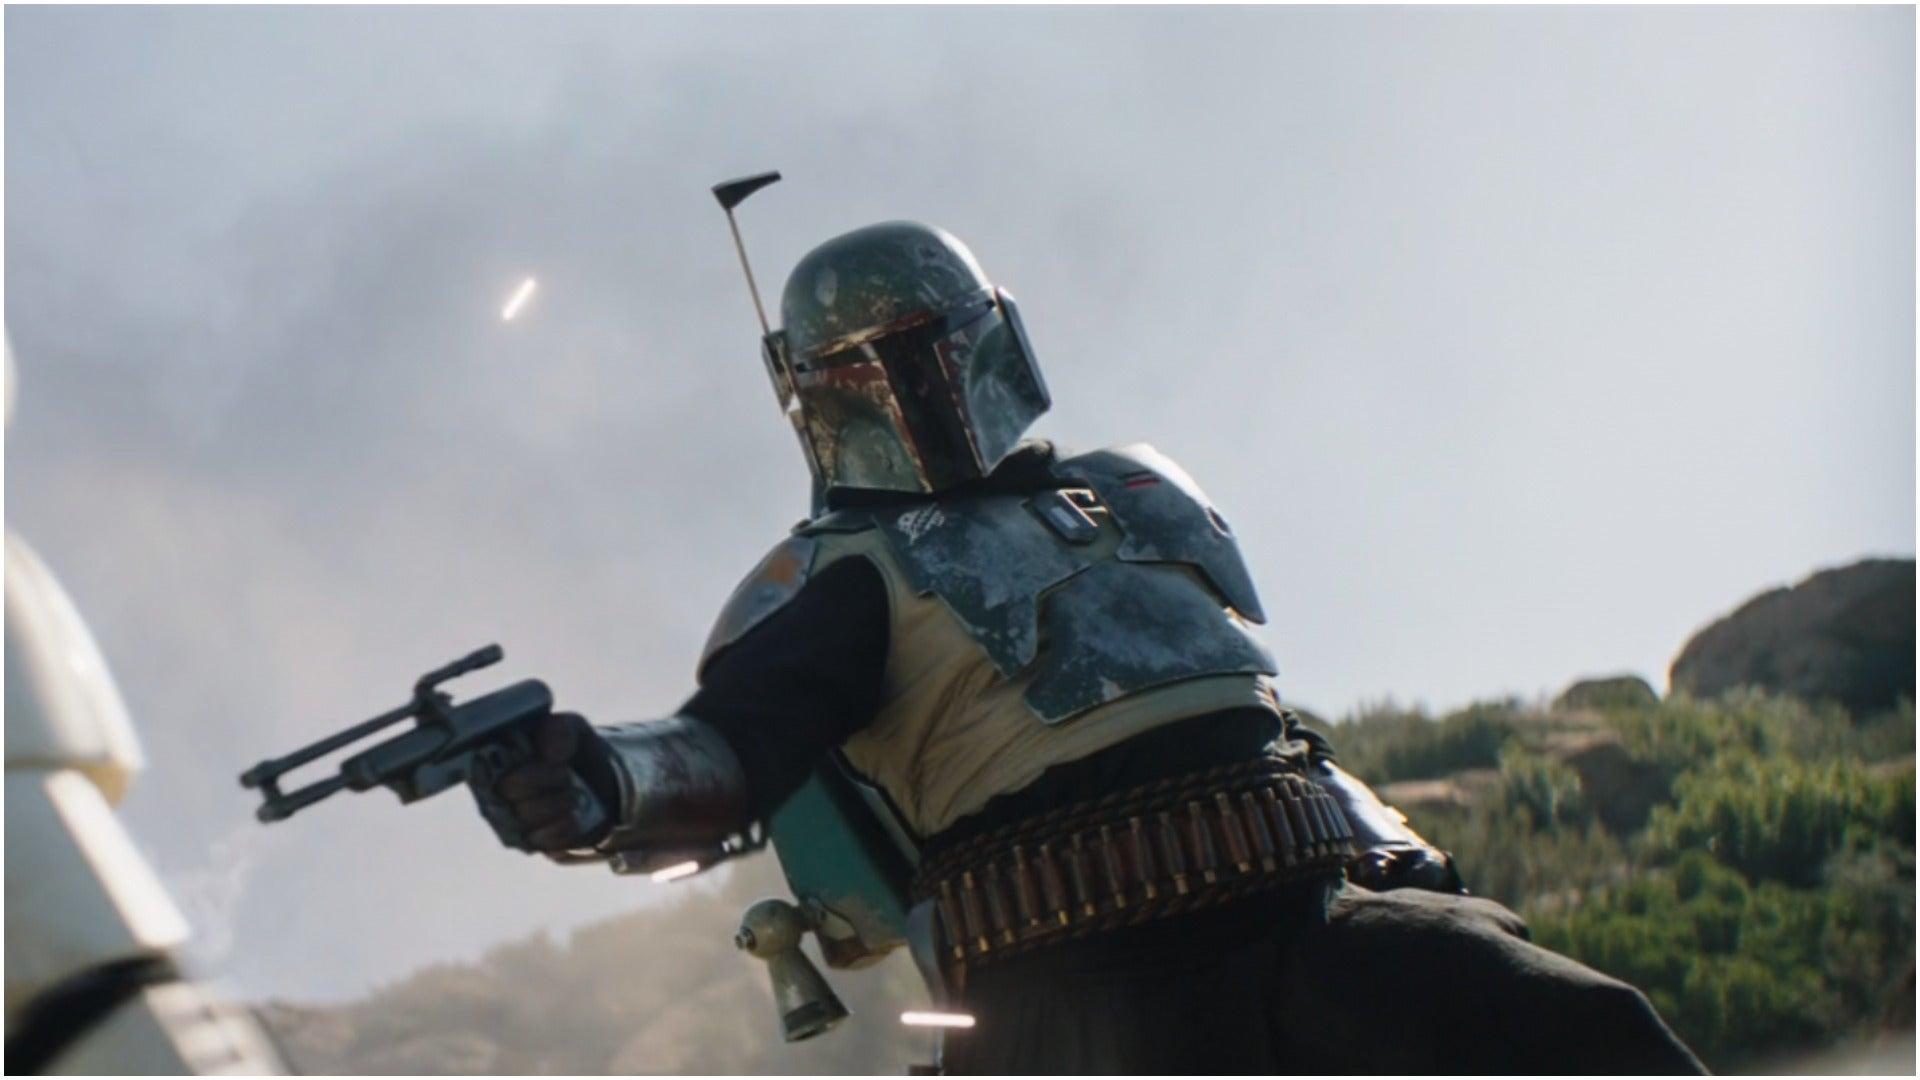 Screenshots taken from Episode 14 of The Mandalorian - Boba Fett in new armor